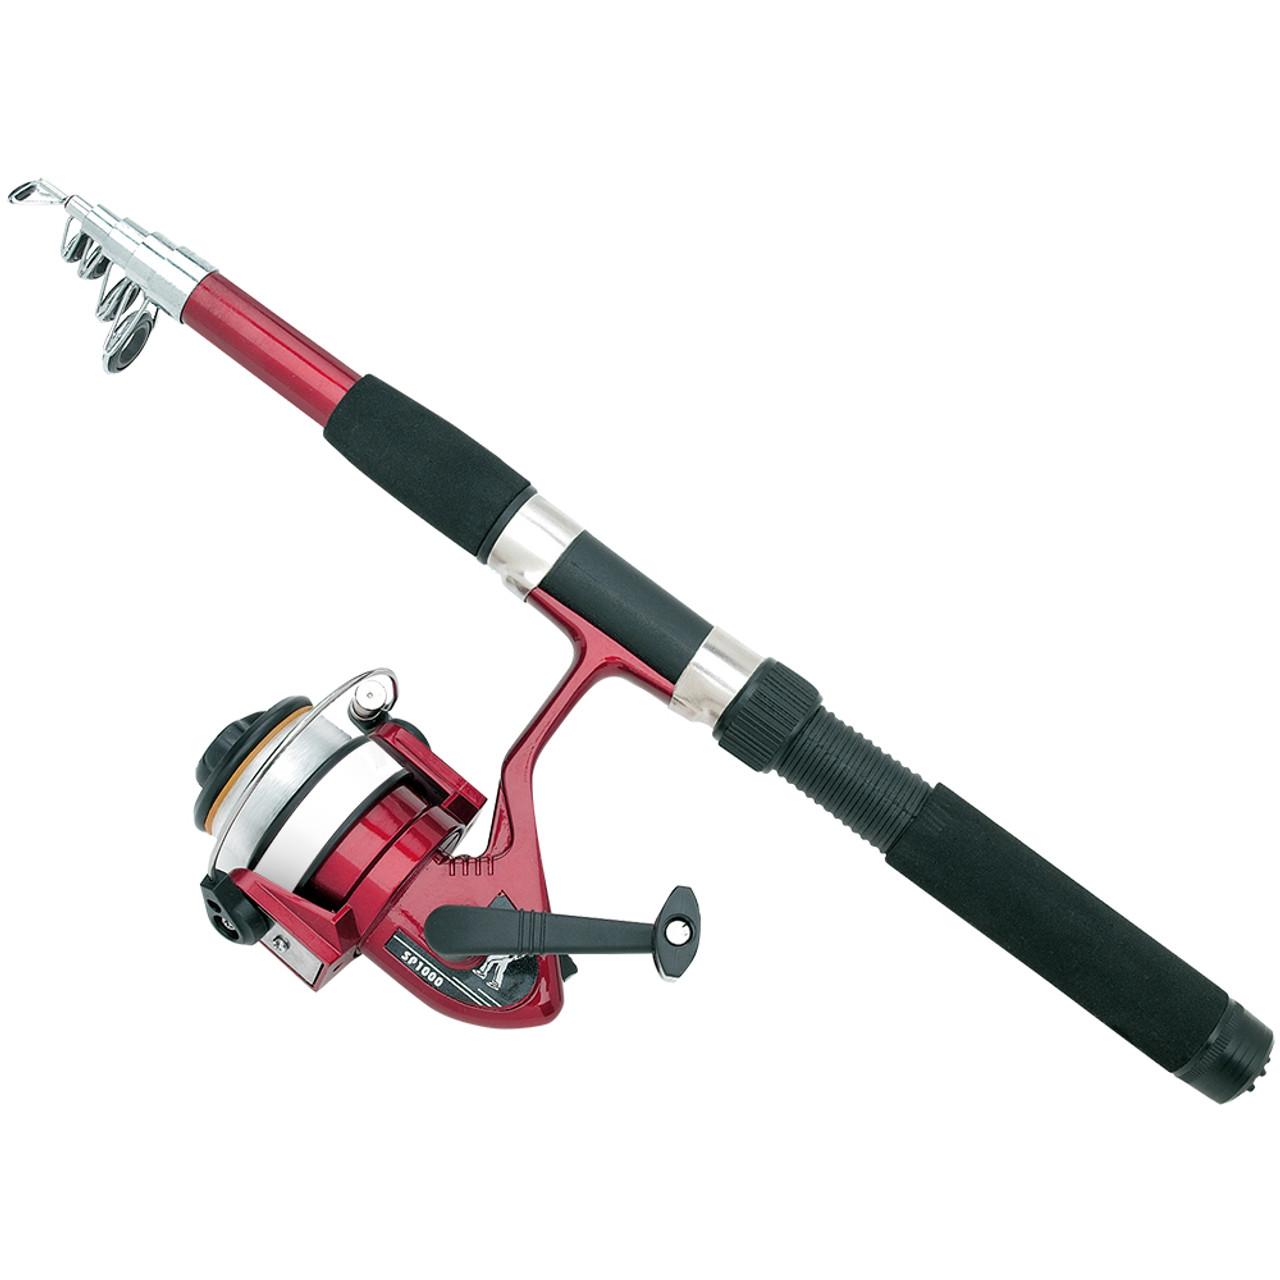 Telescoping Fishing Rod & Reel Set